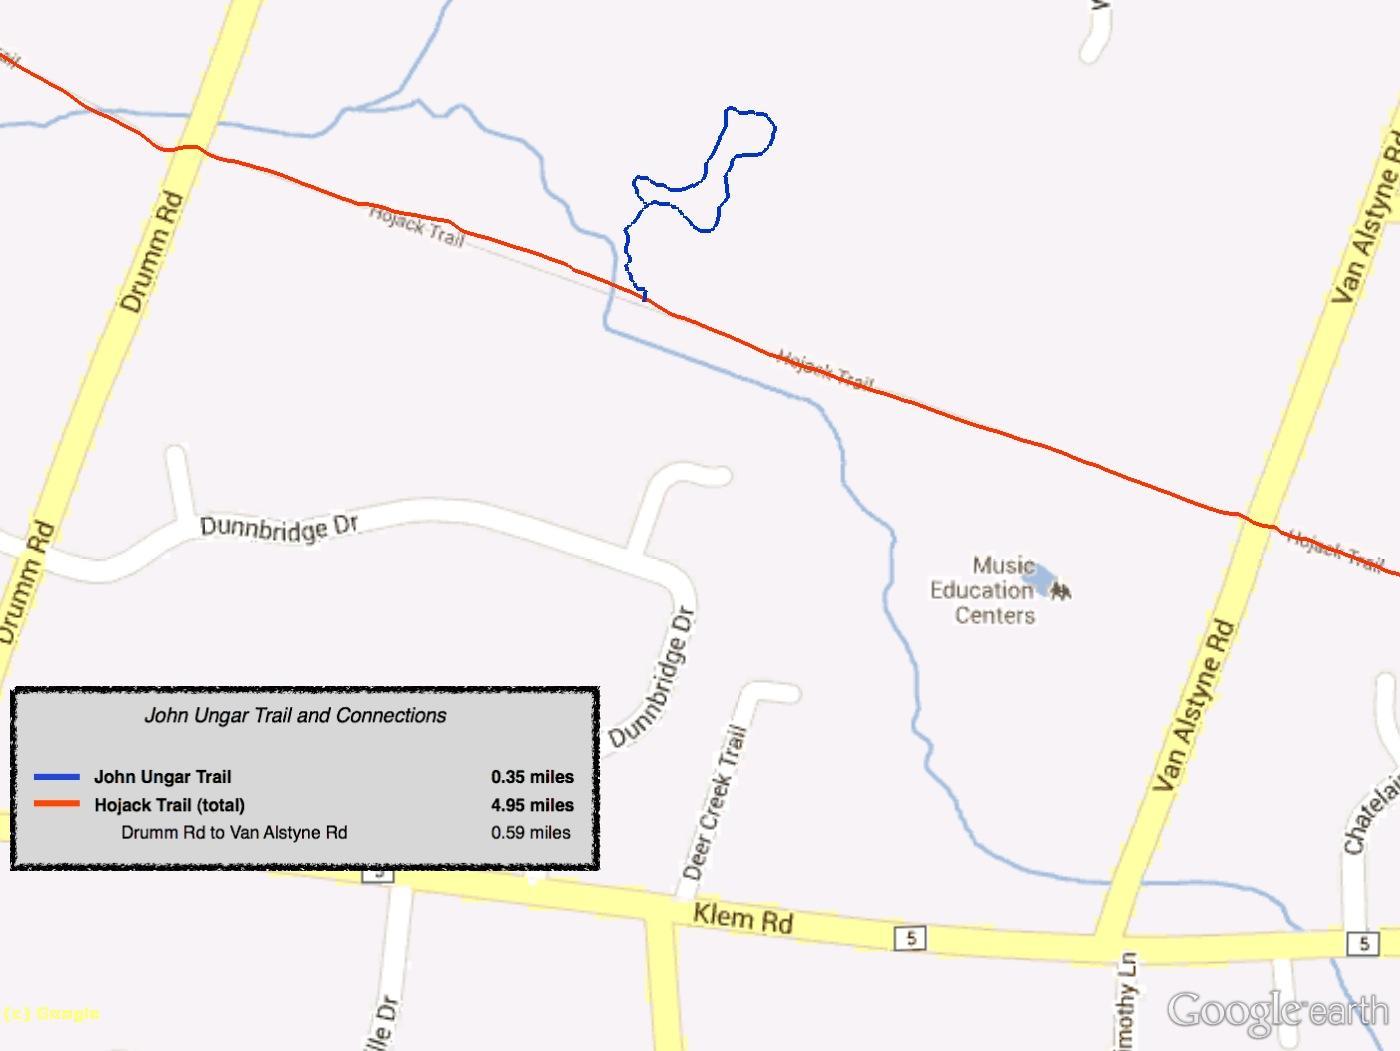 Friends Of Webster Trails - Printable satellite maps